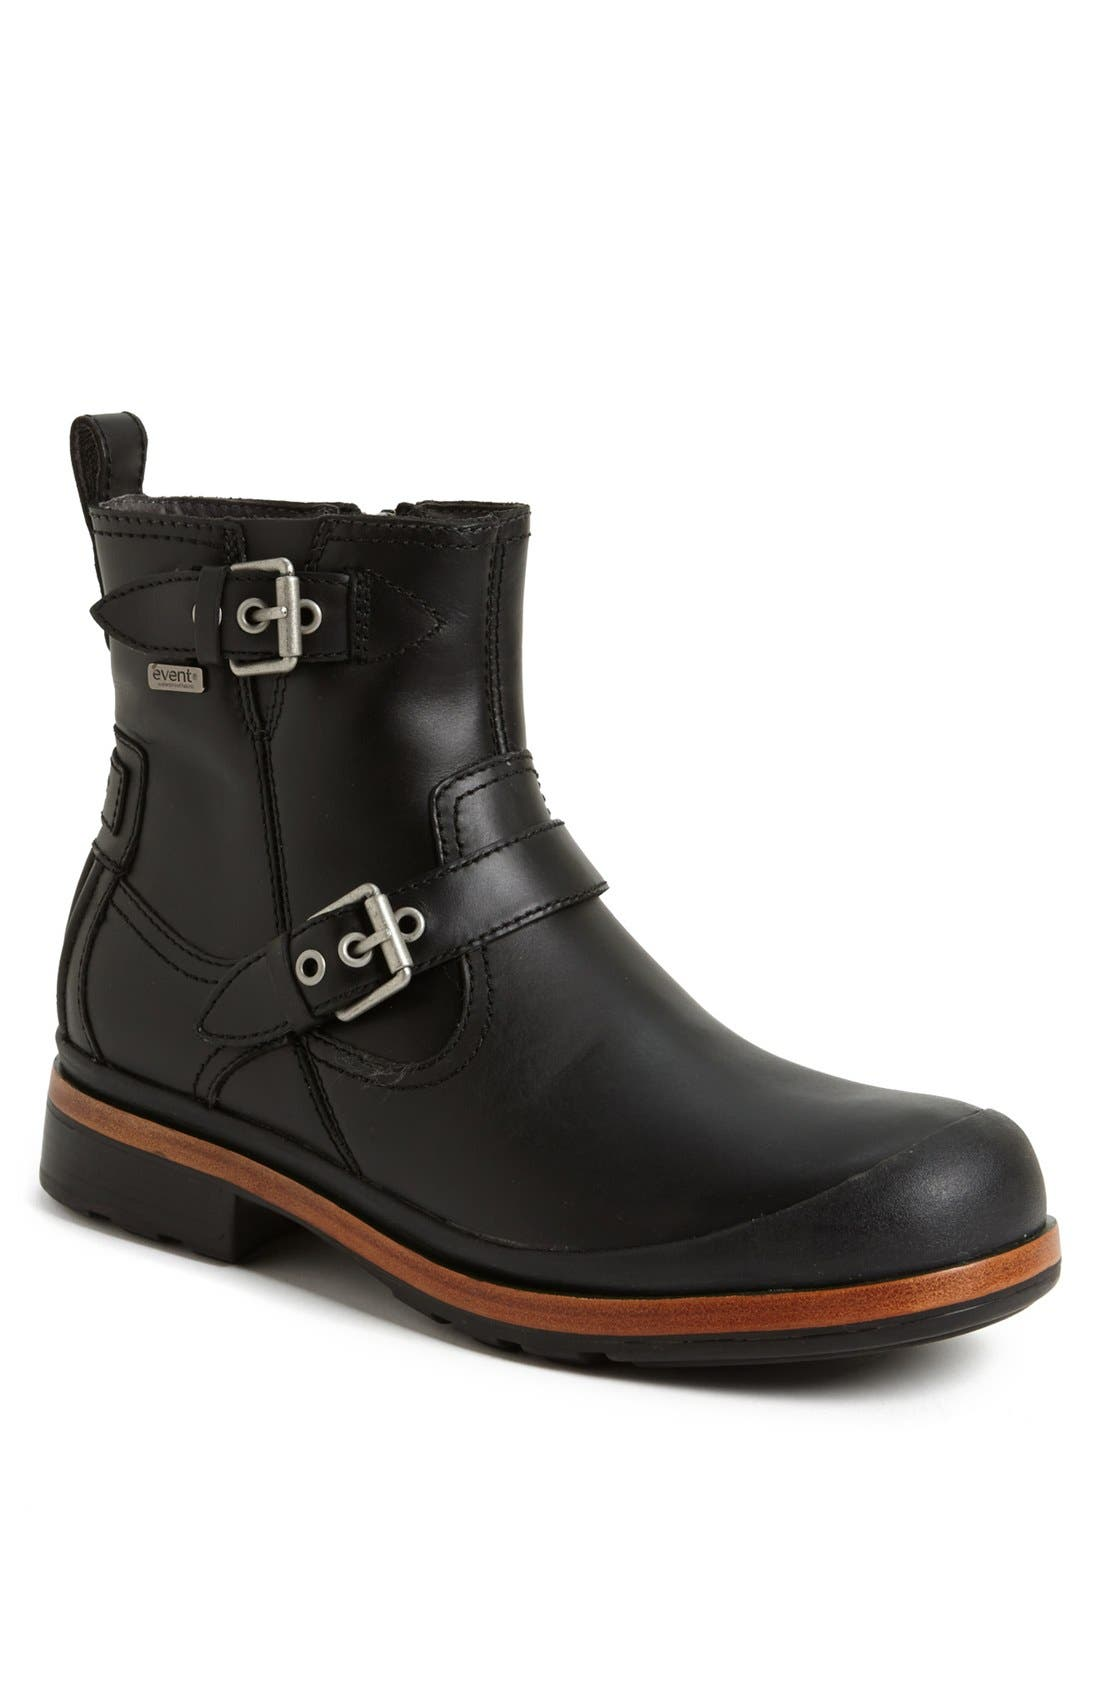 Alternate Image 1 Selected - UGG® Australia 'Alston' Zip Boot